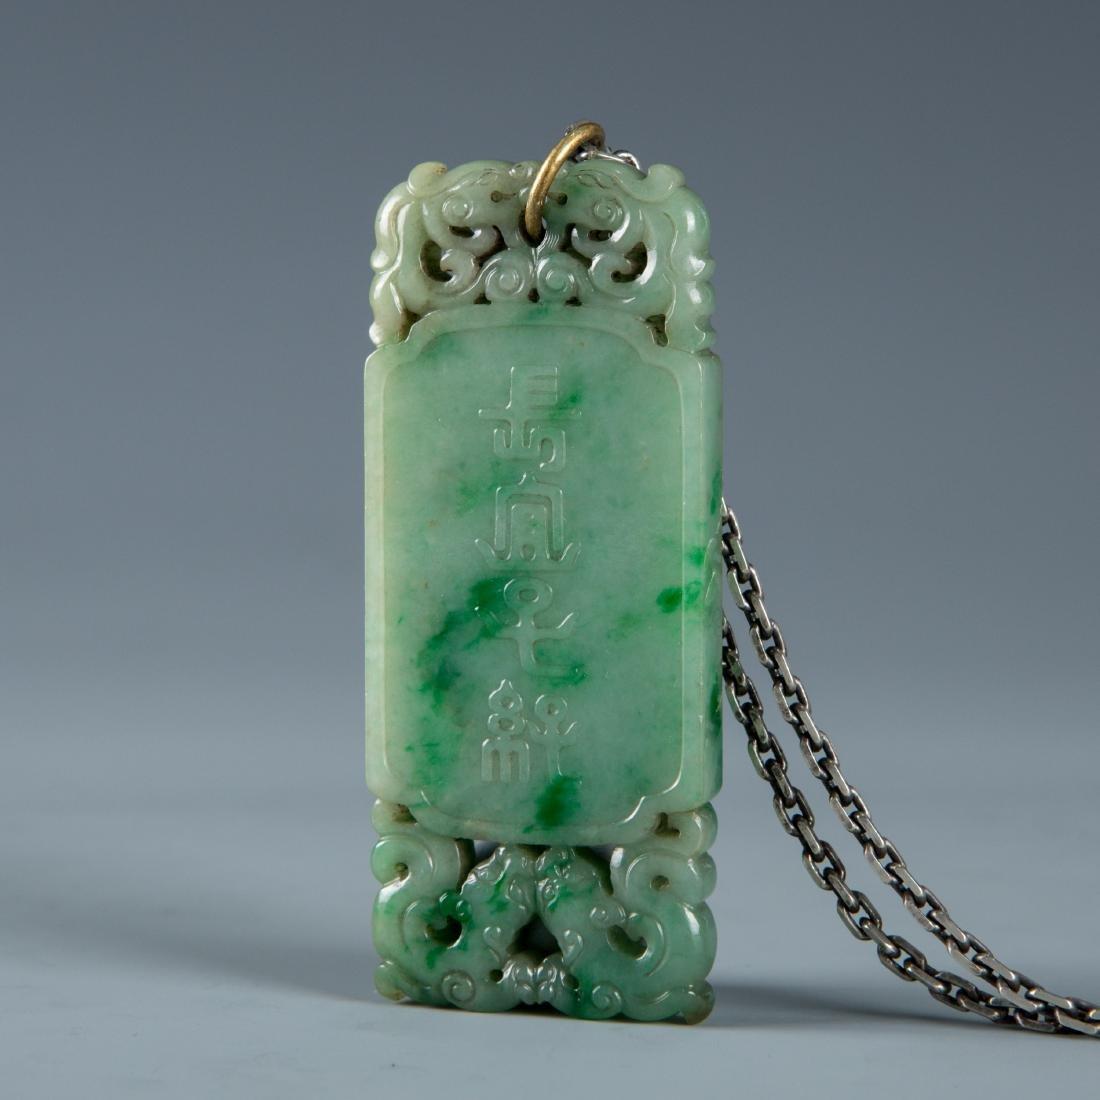 Jadeite Pendant on chain necklace